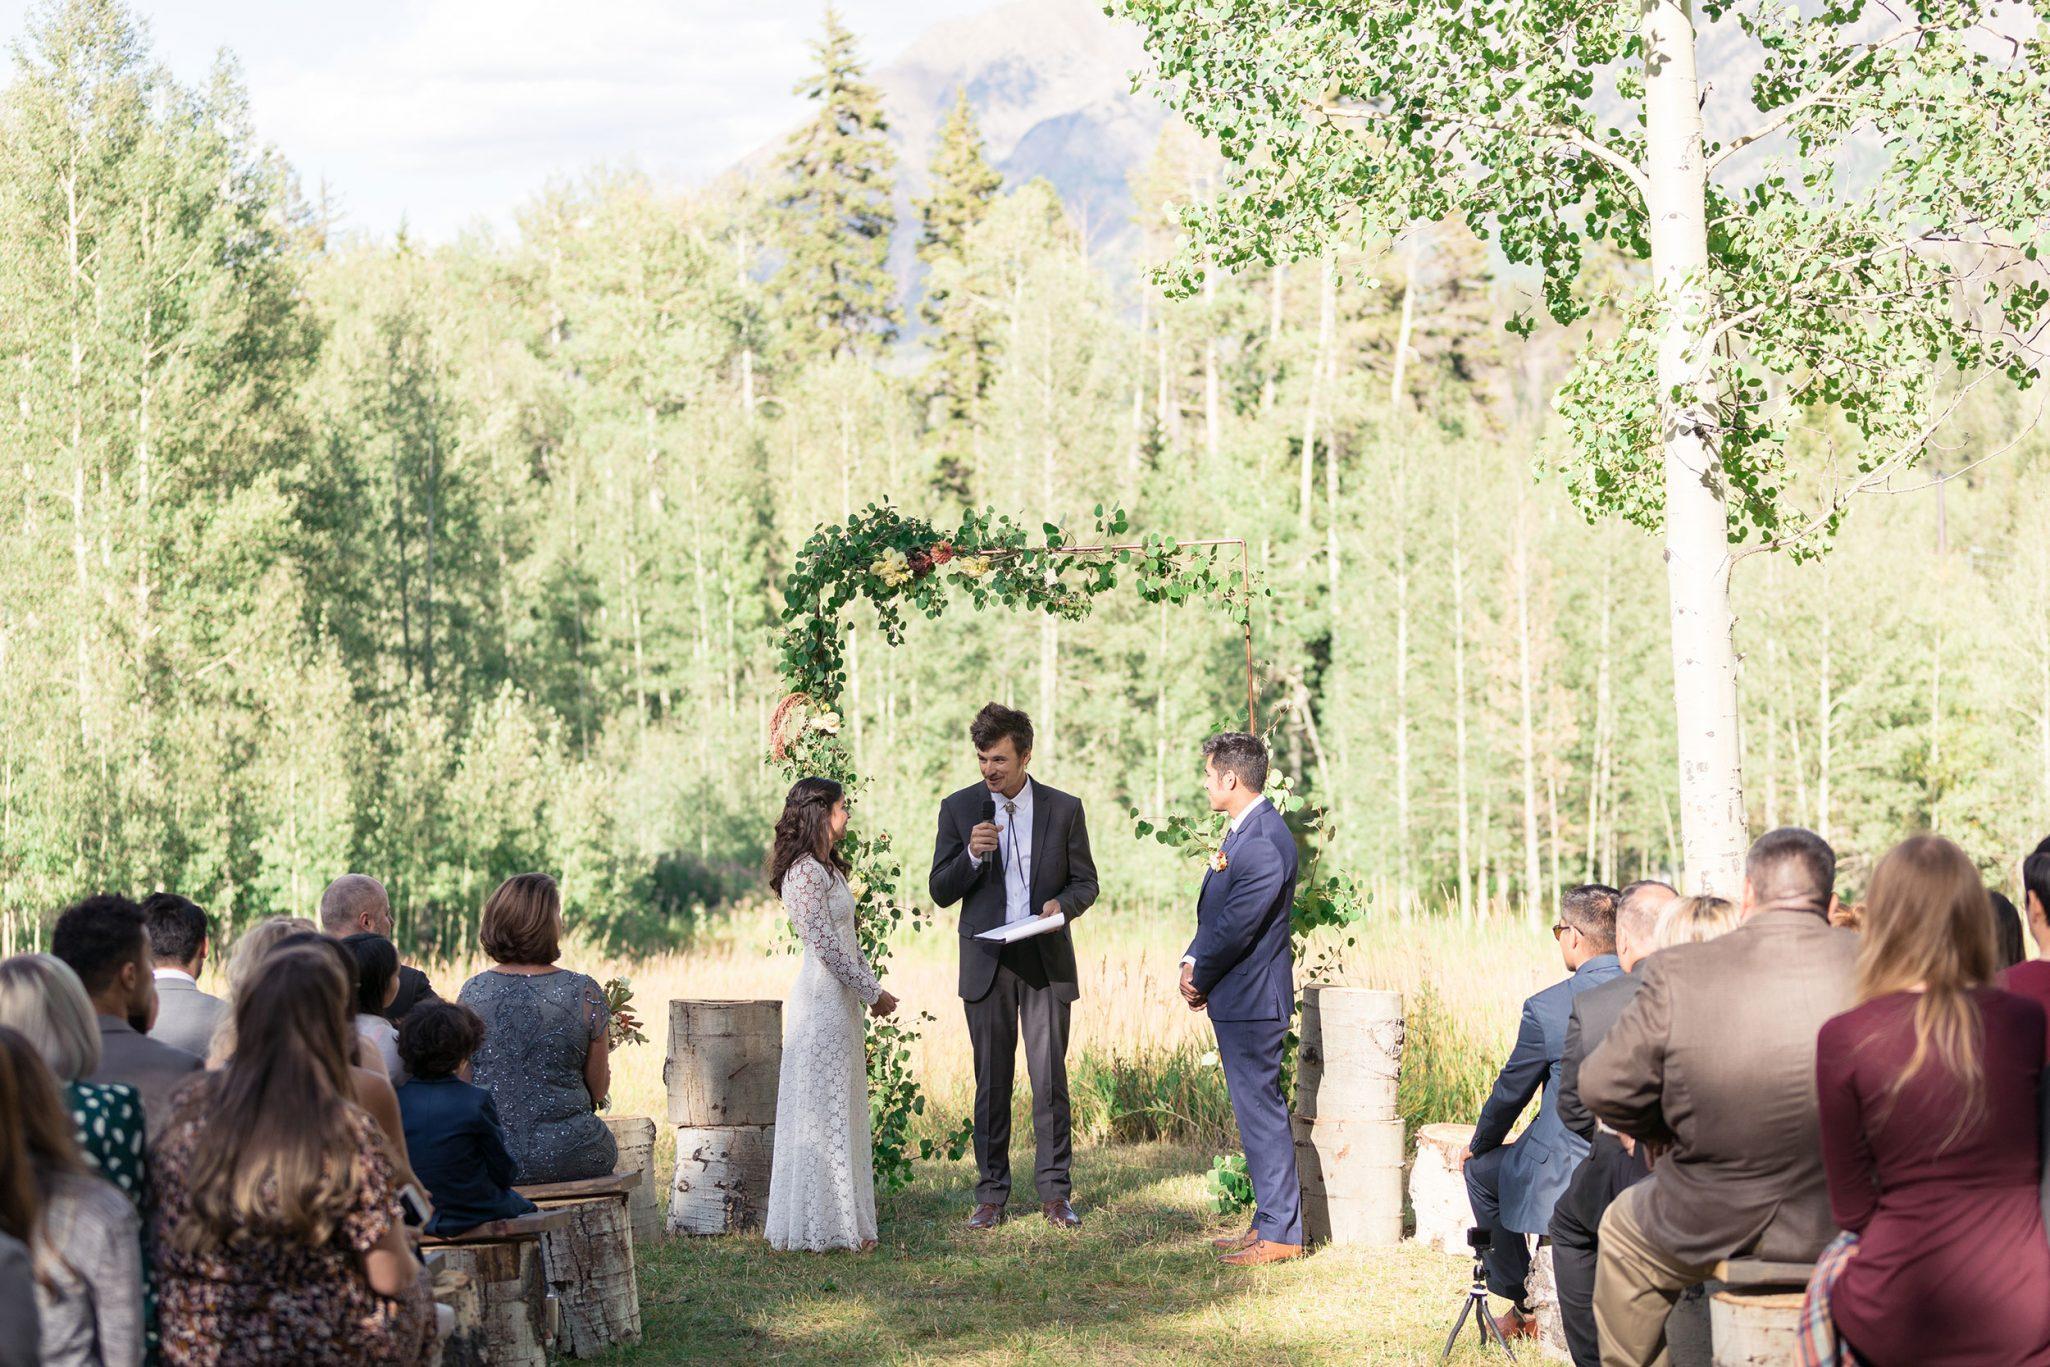 Mountain Ceremony at Silverpick Lodge, Durango, Colorado